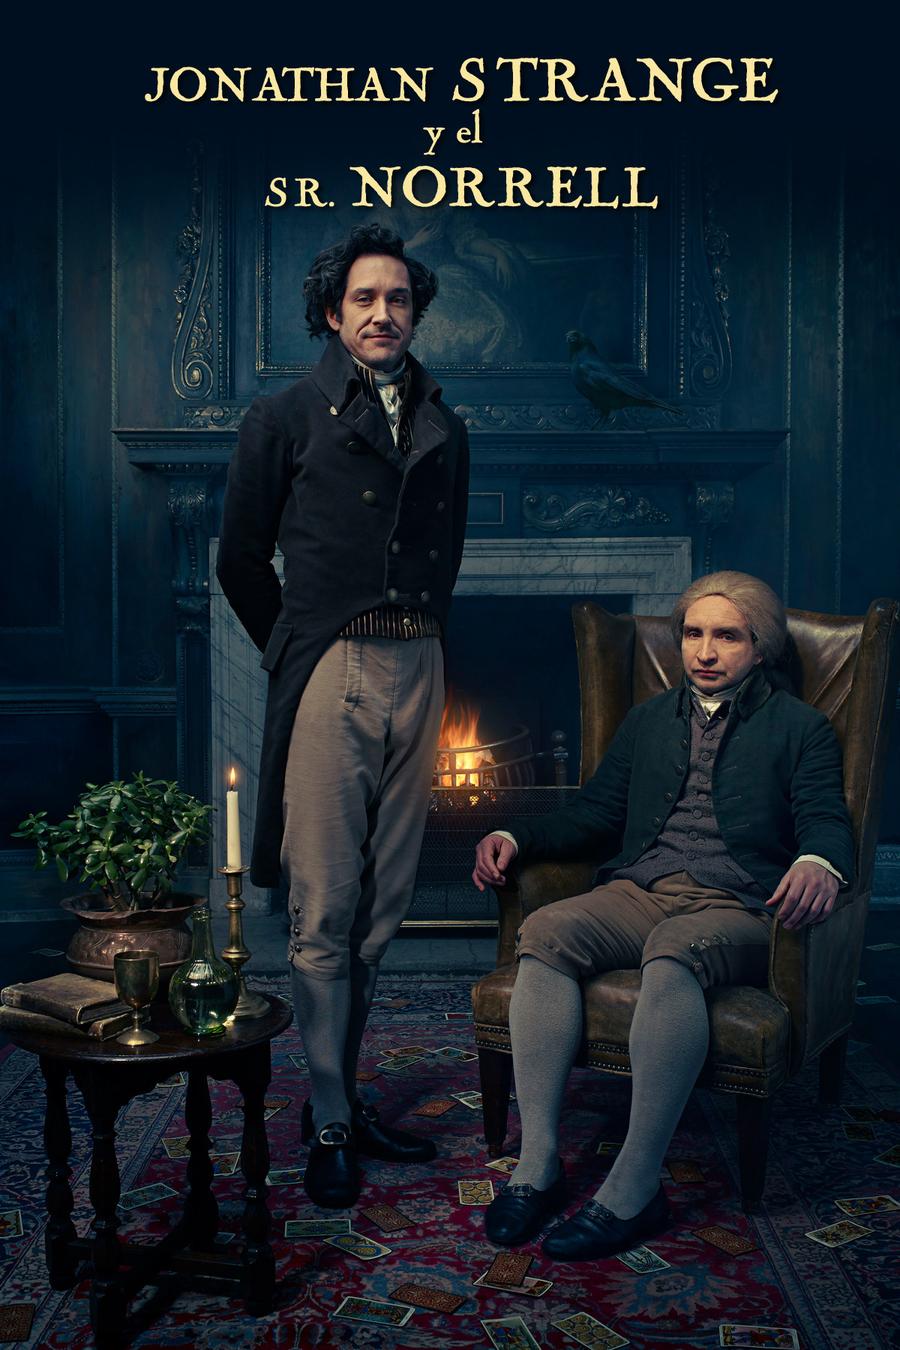 Jonathan Strange y el Sr. Norrell